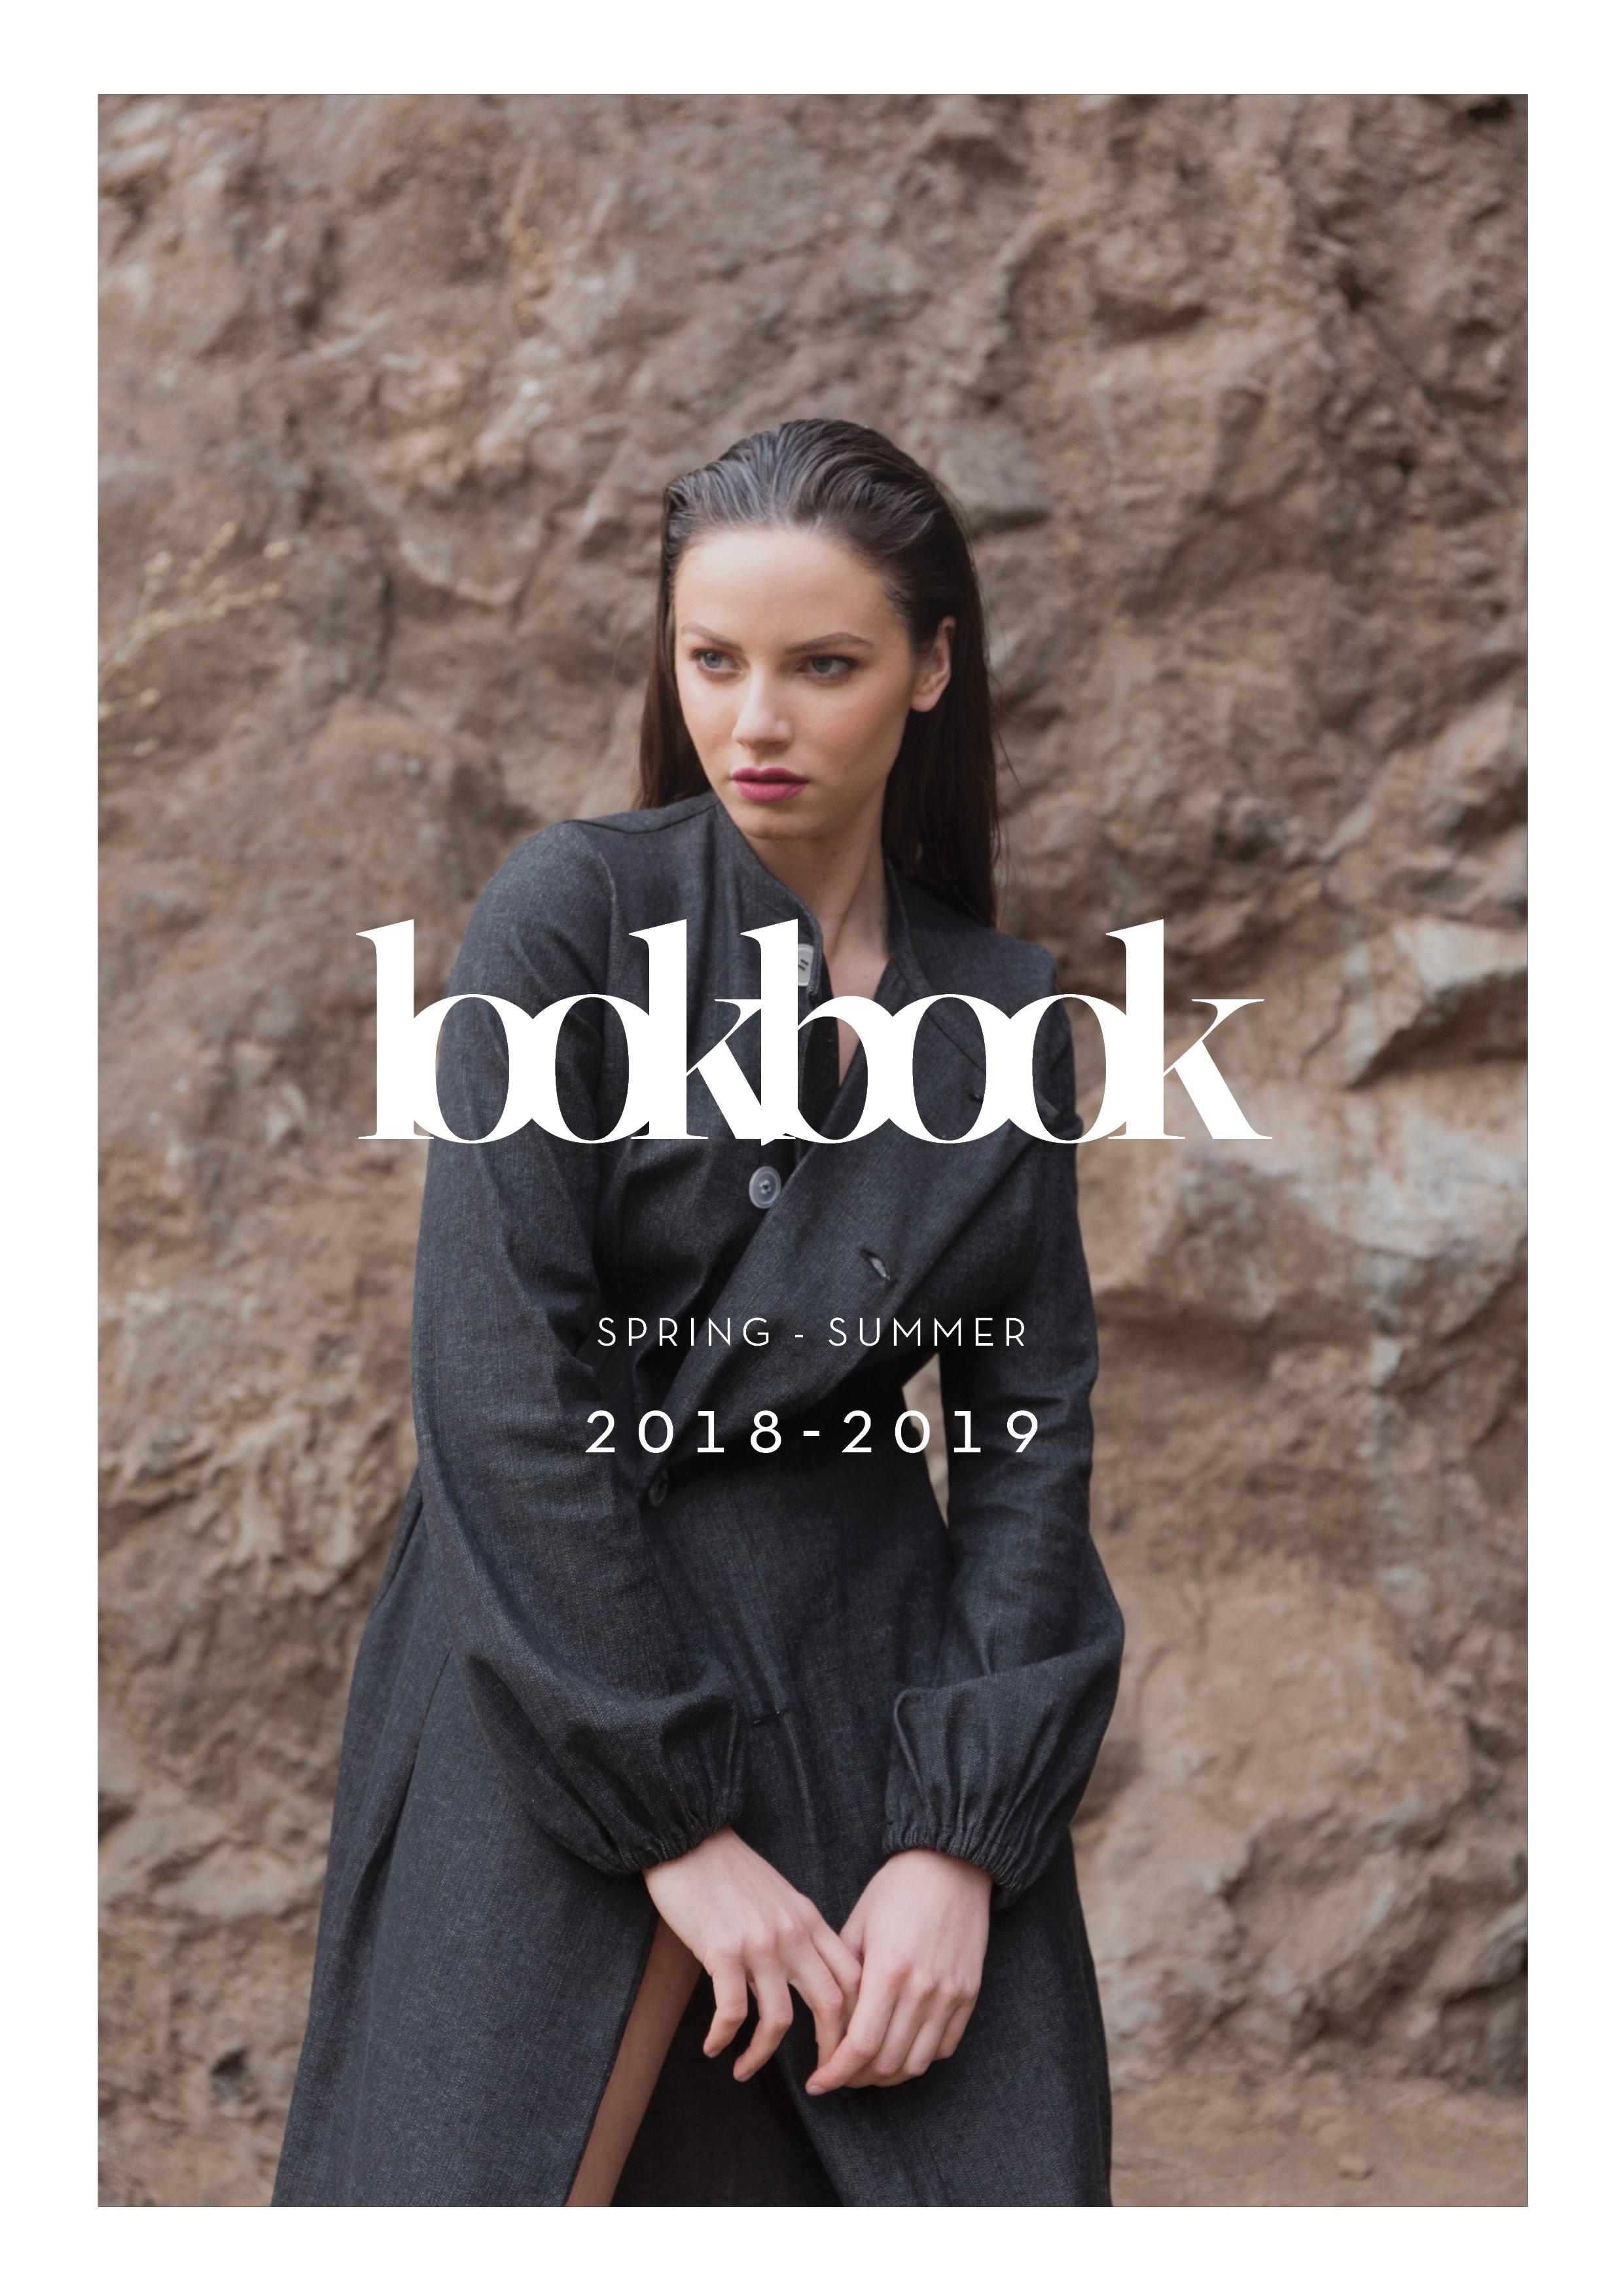 TIENA Memphis Fashion Designer Spring Summer 201-2019 Lookbook